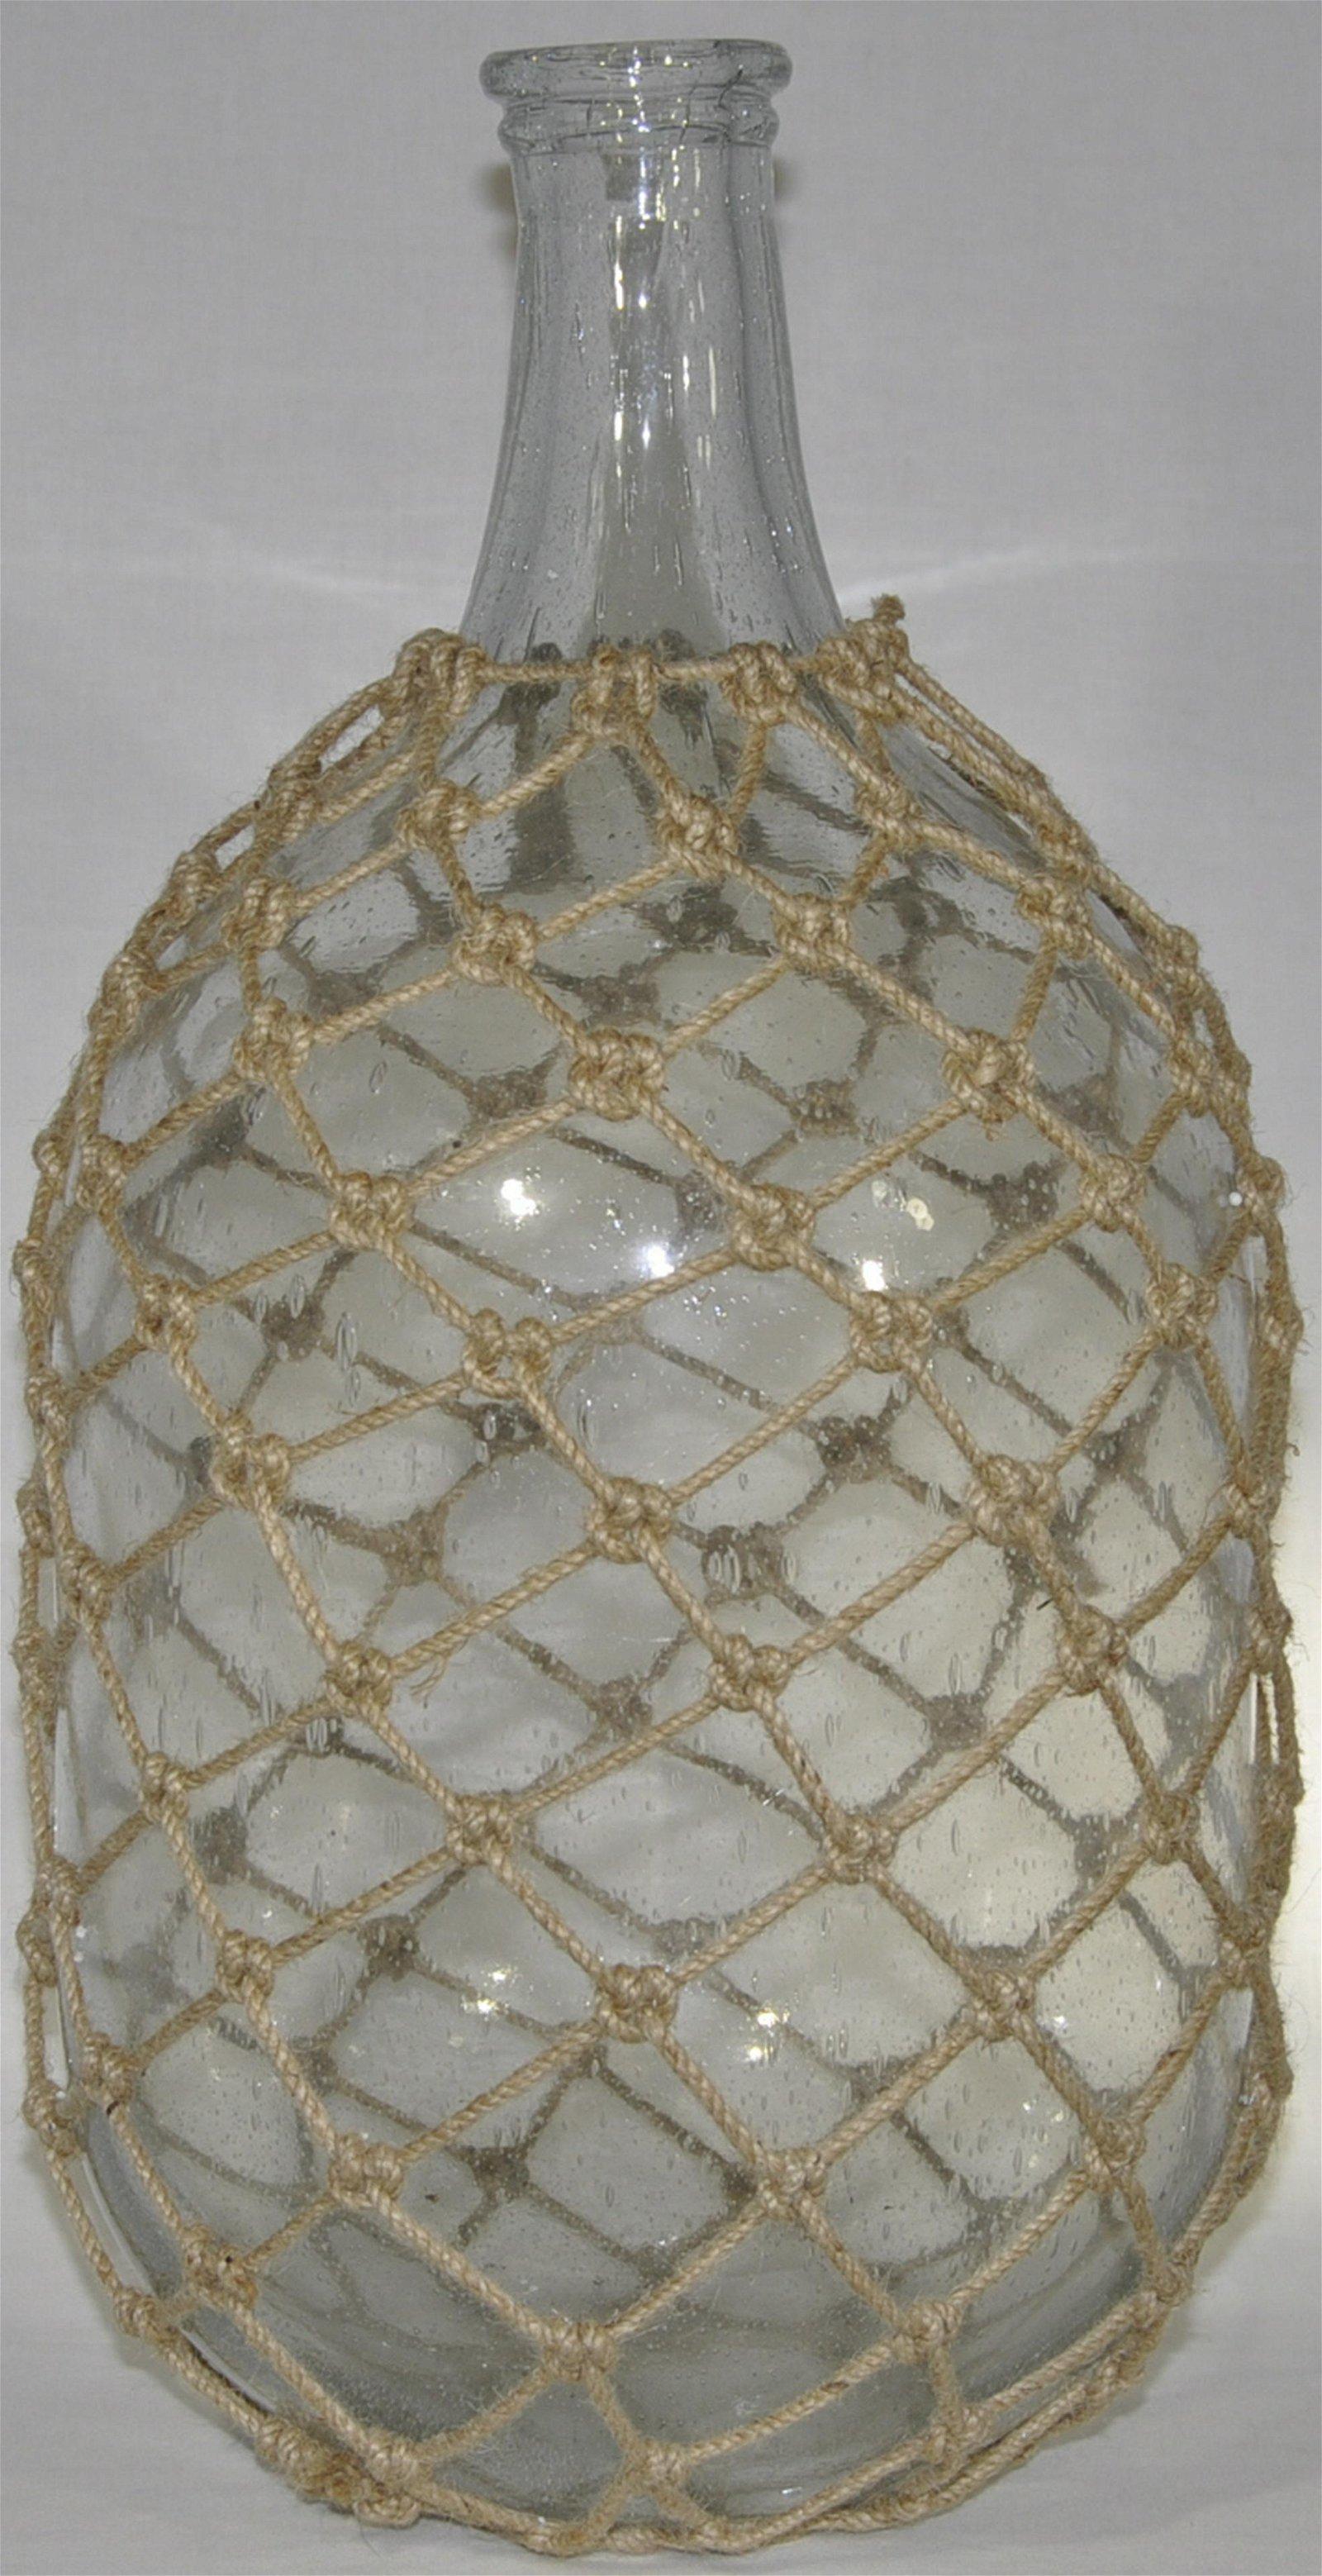 Oversized Decorative Glass Jug With Jute Netting